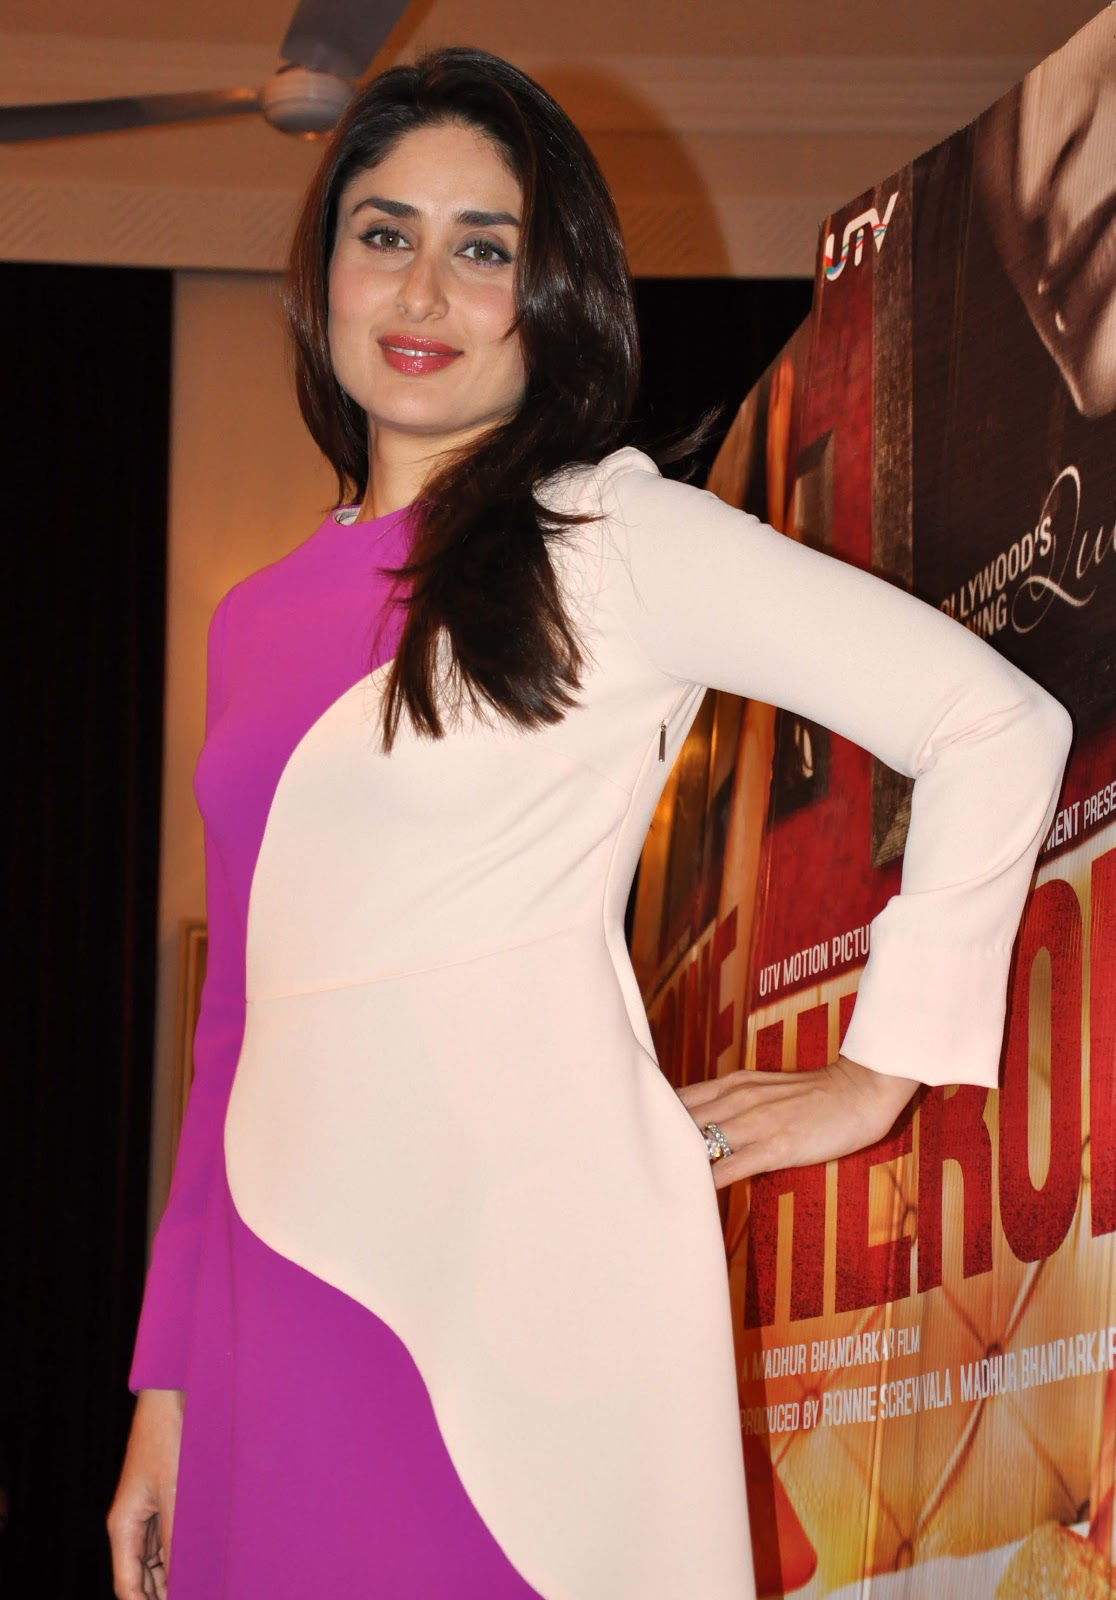 Allama Iqbal Wallpapers Hd Knowledge World Kareena Kapoor Wallpapers 3